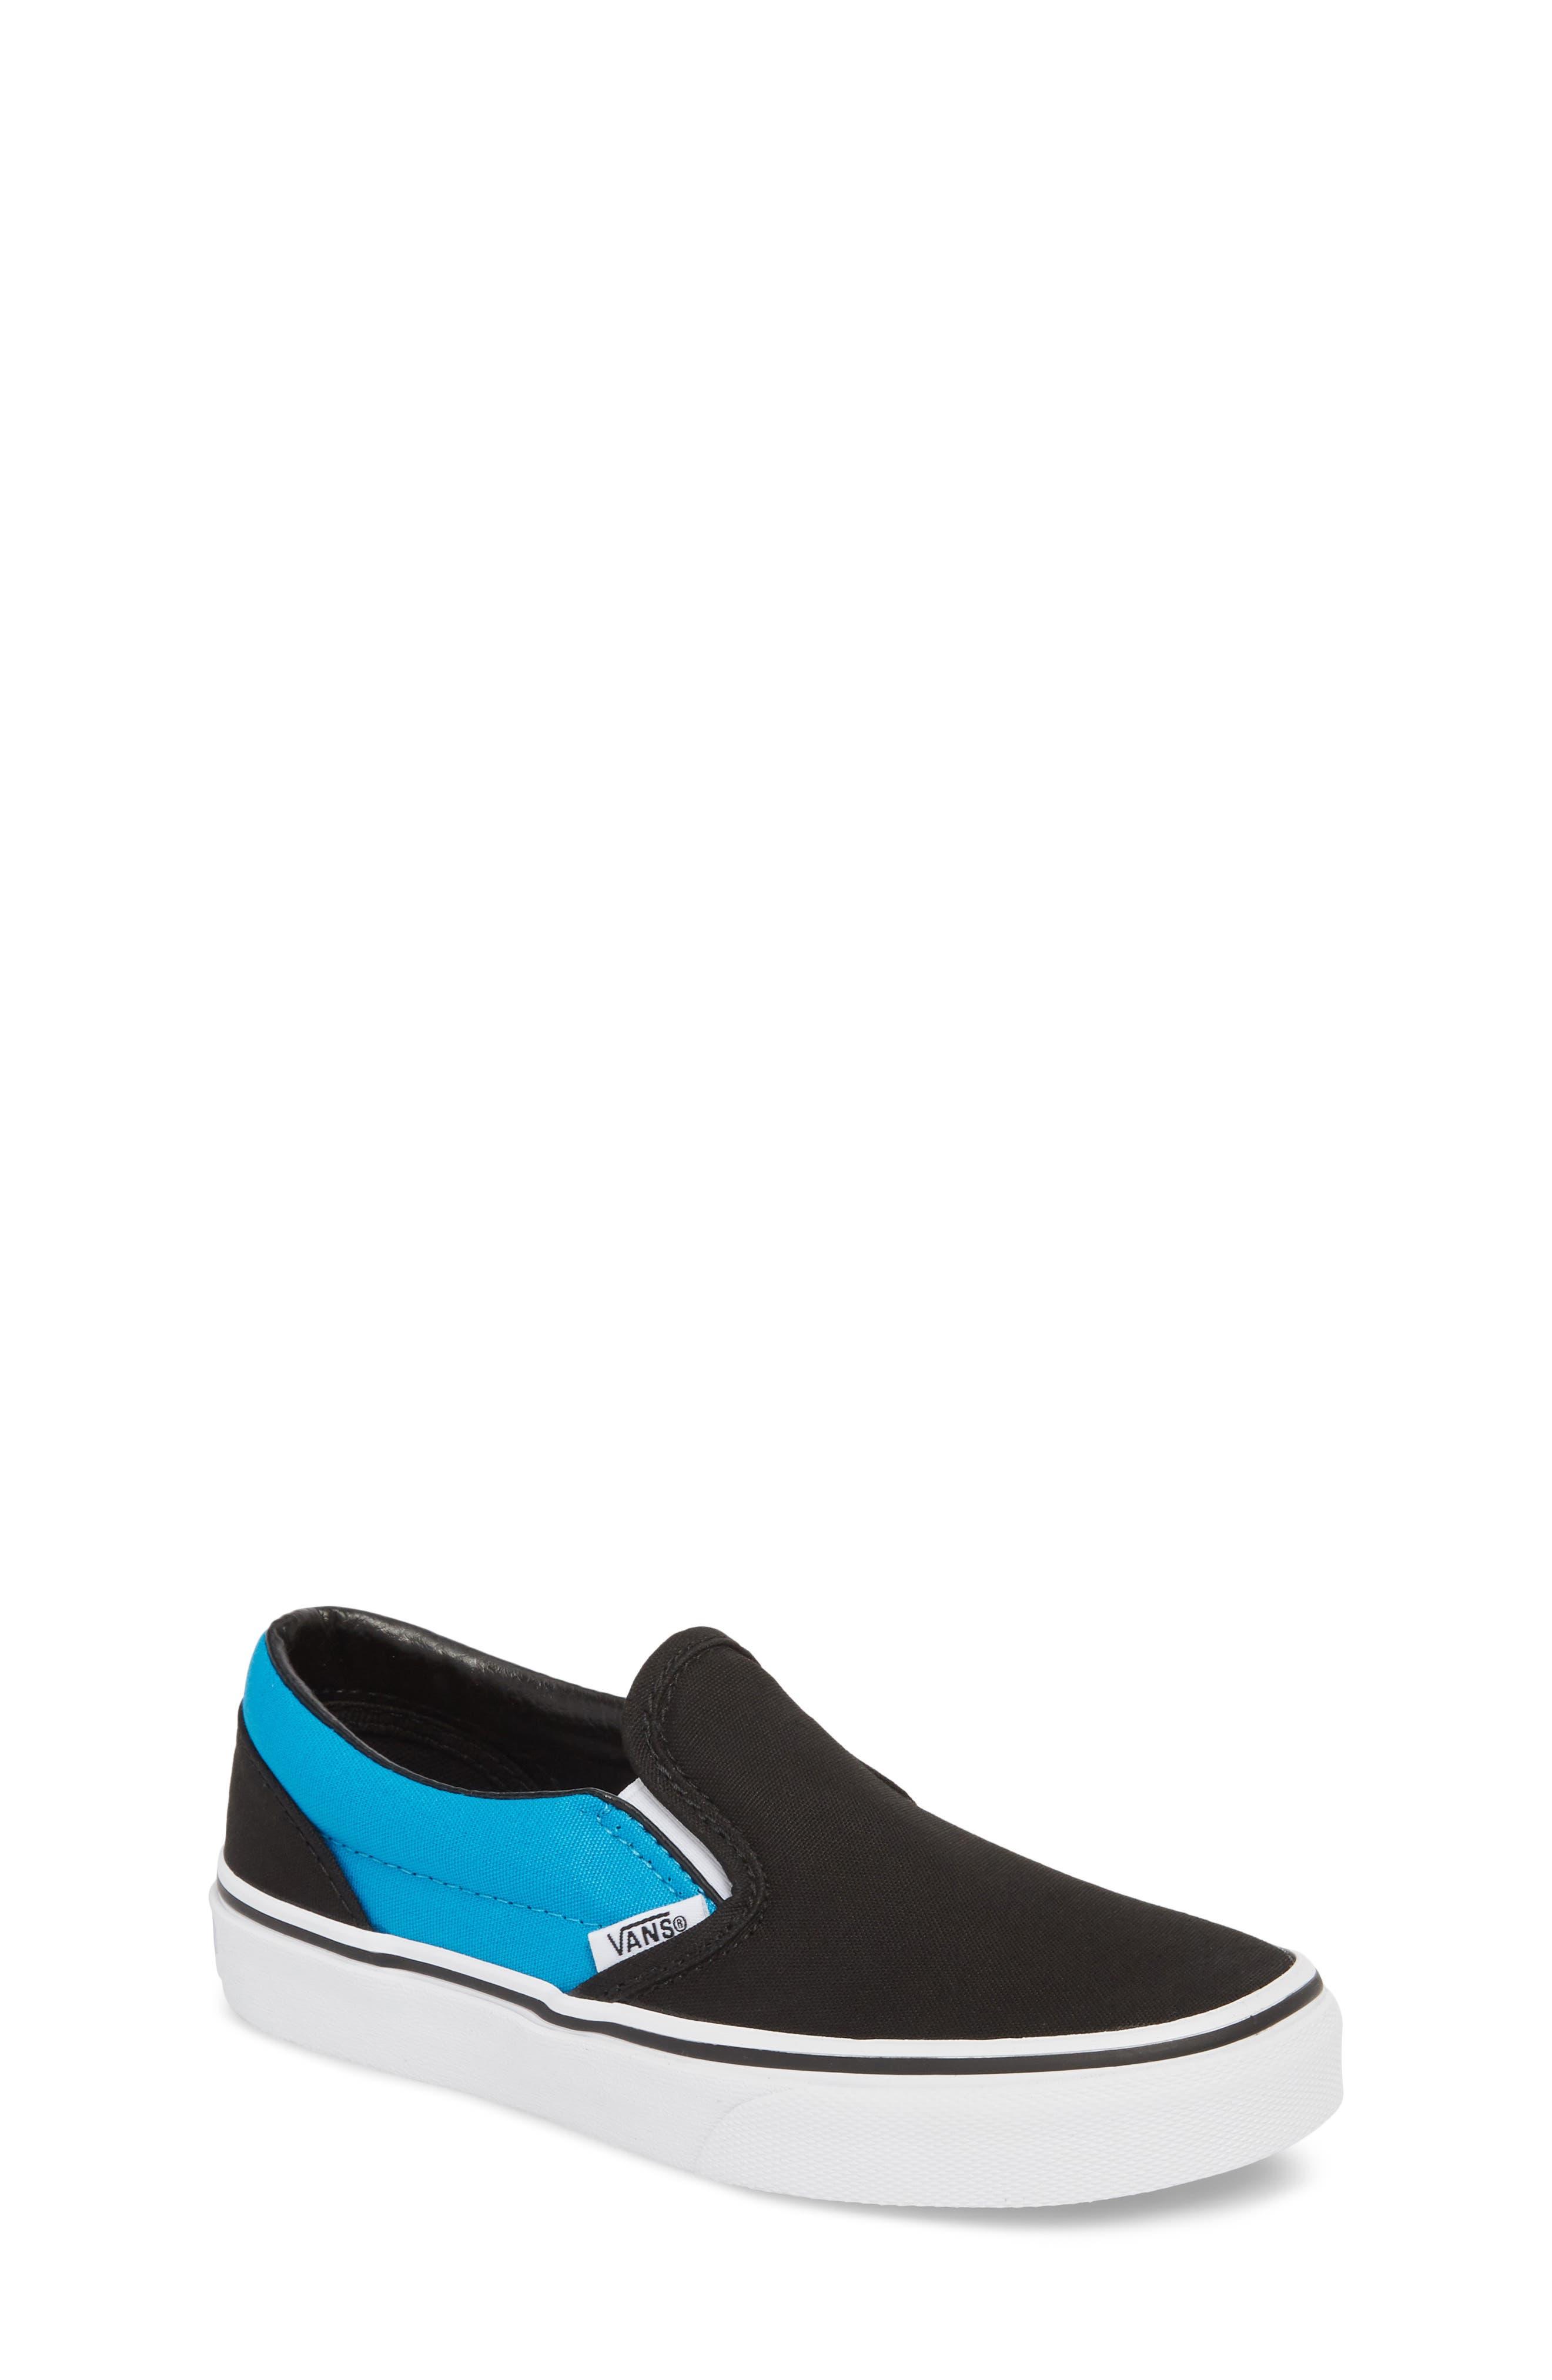 Toddler Vans Classic SlipOn Size 11 M  Black